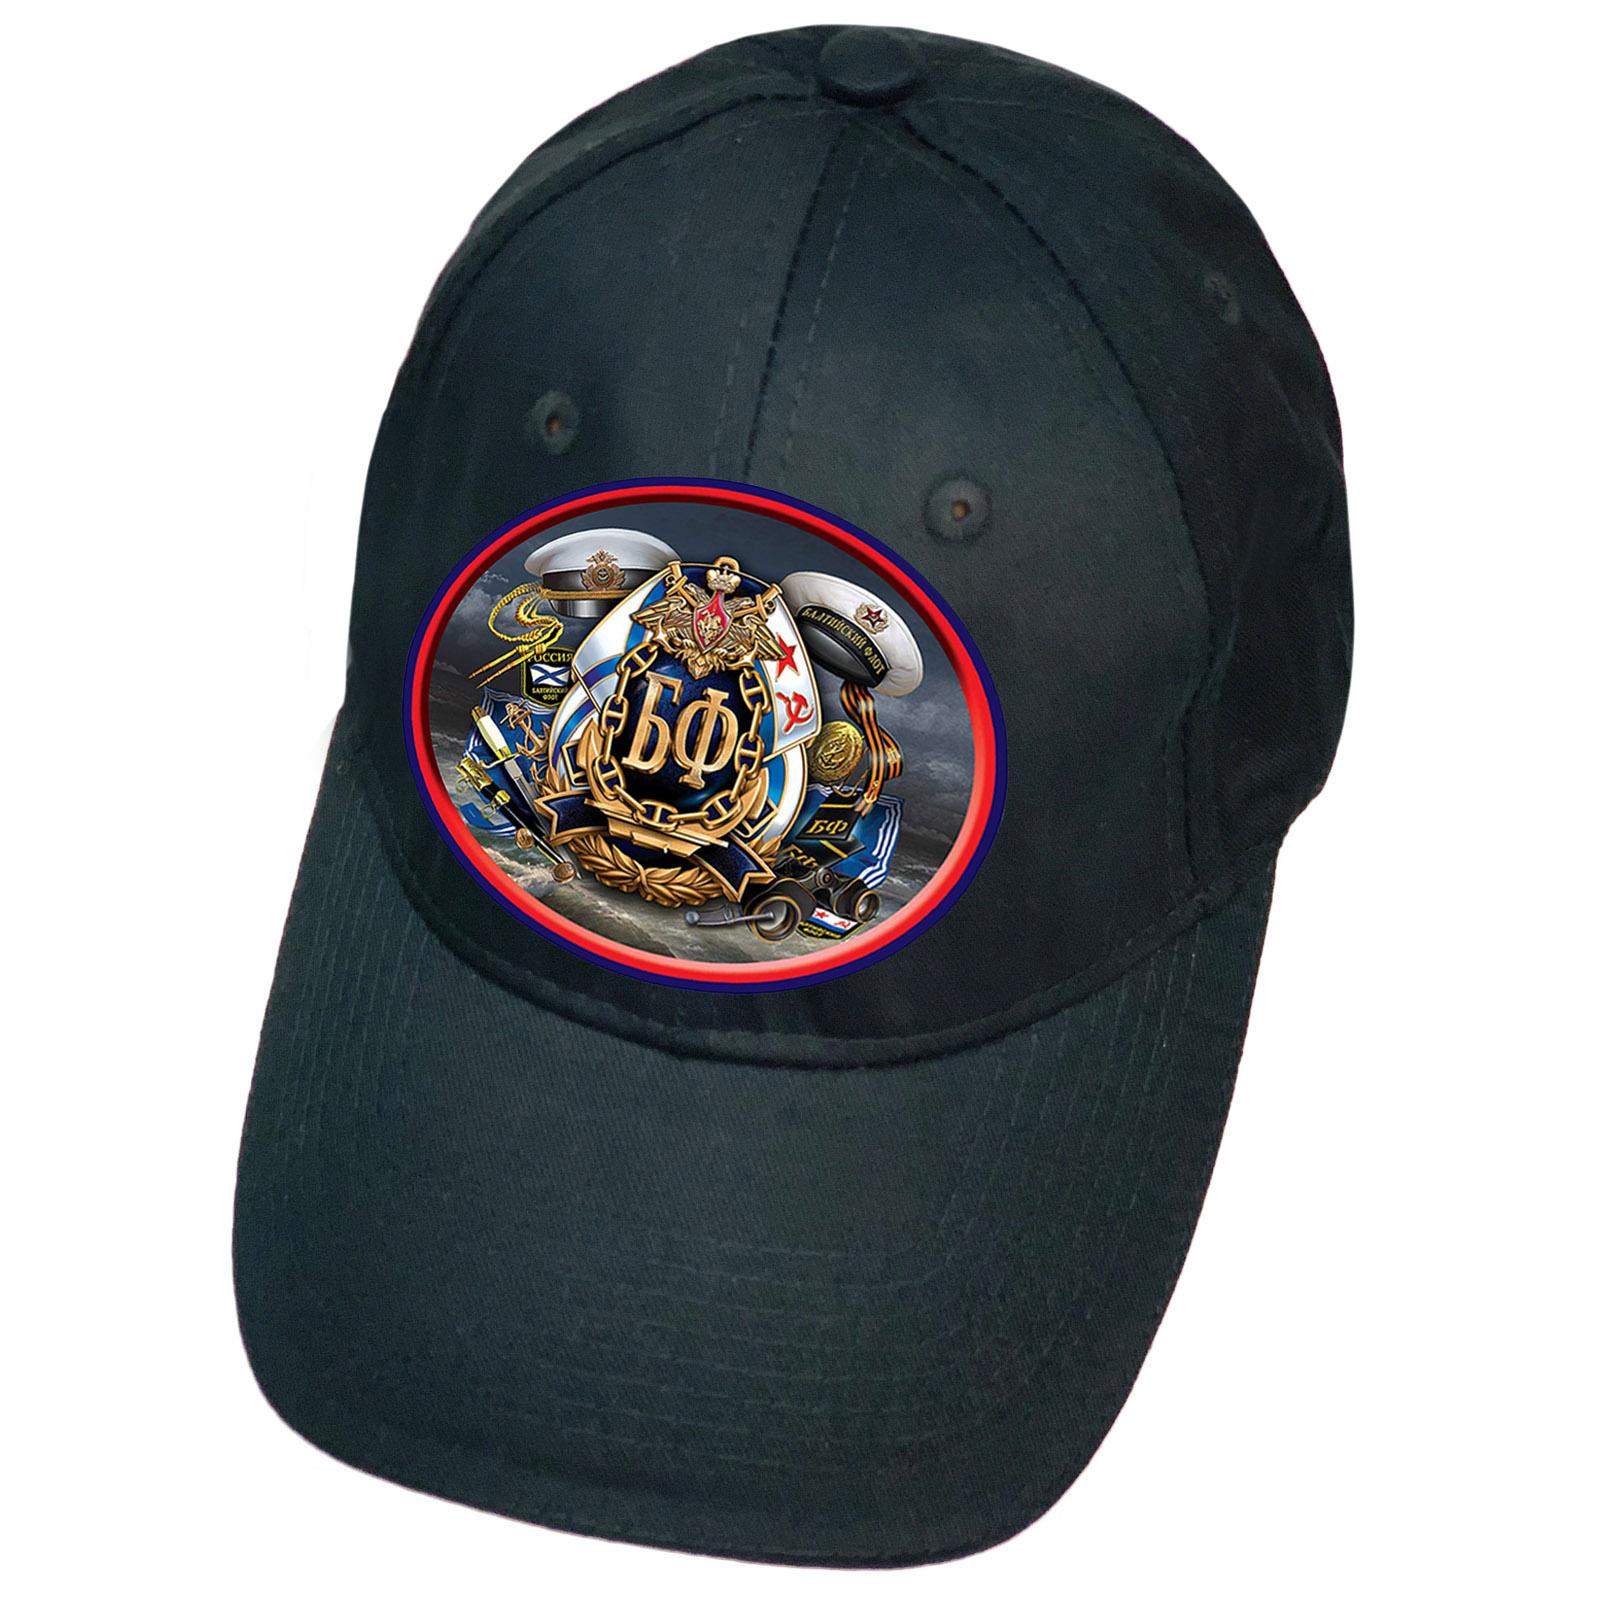 Тёмно-синяя кепка с термотрансфером БФ